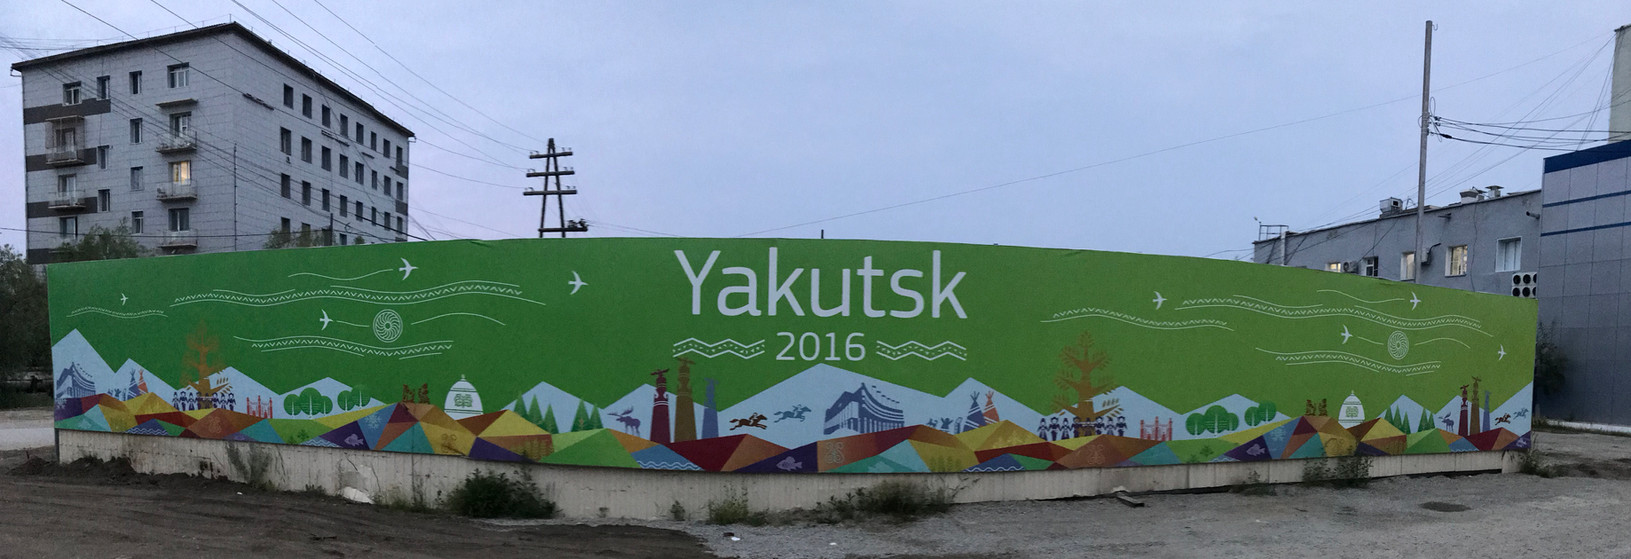 Mural in Yakutsk